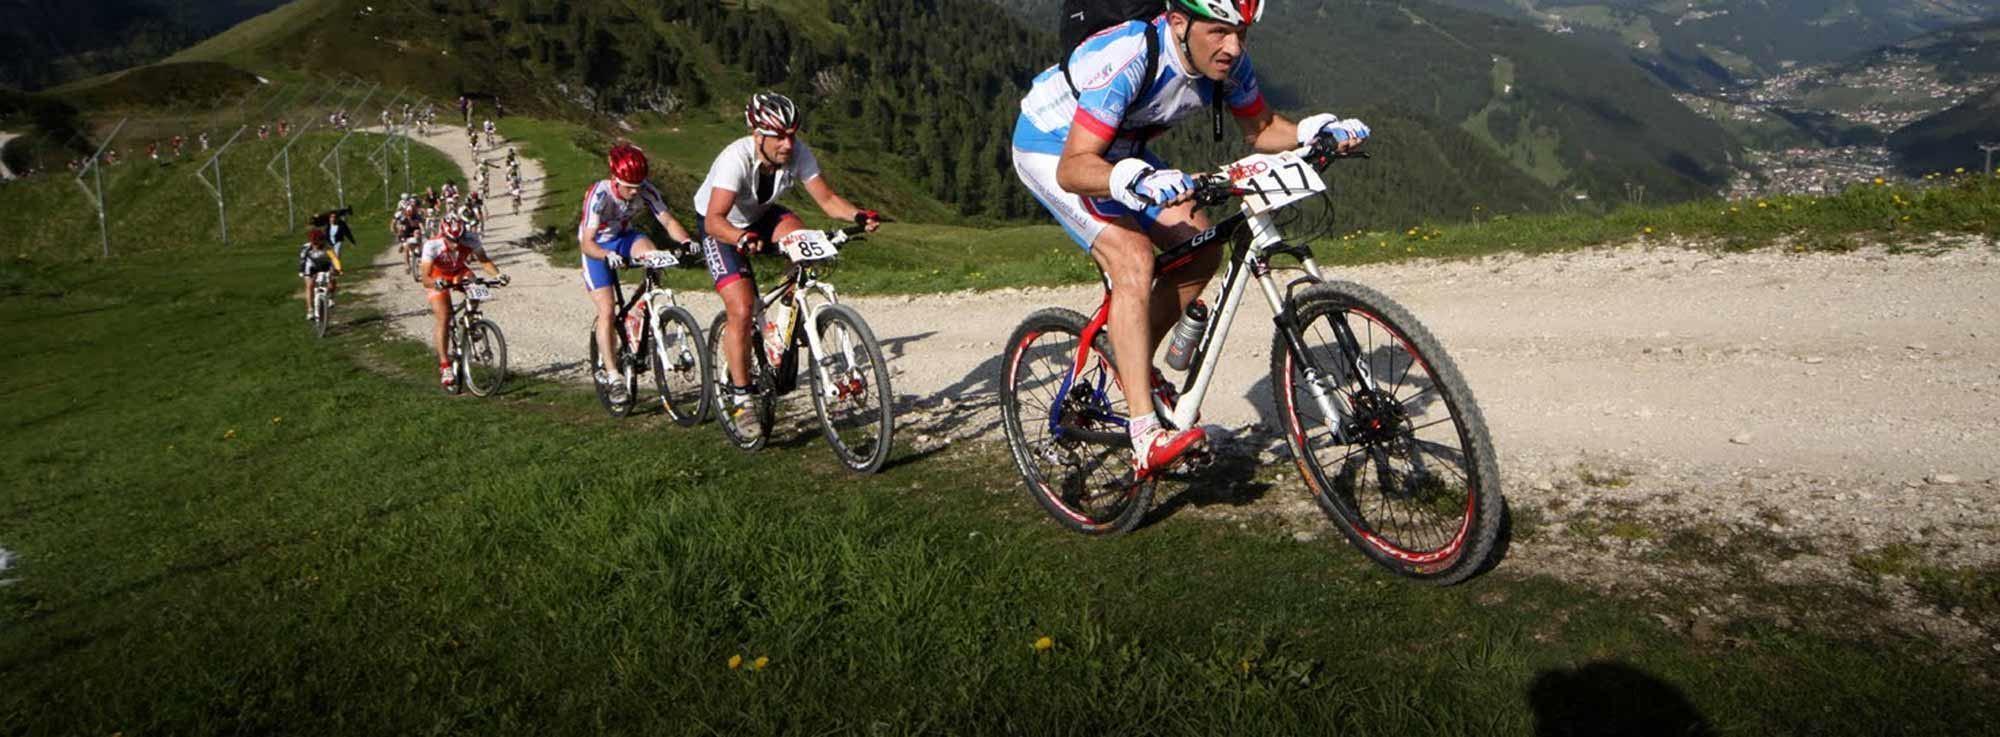 30 apr 2017: Marathon Mtb Castel del Monte